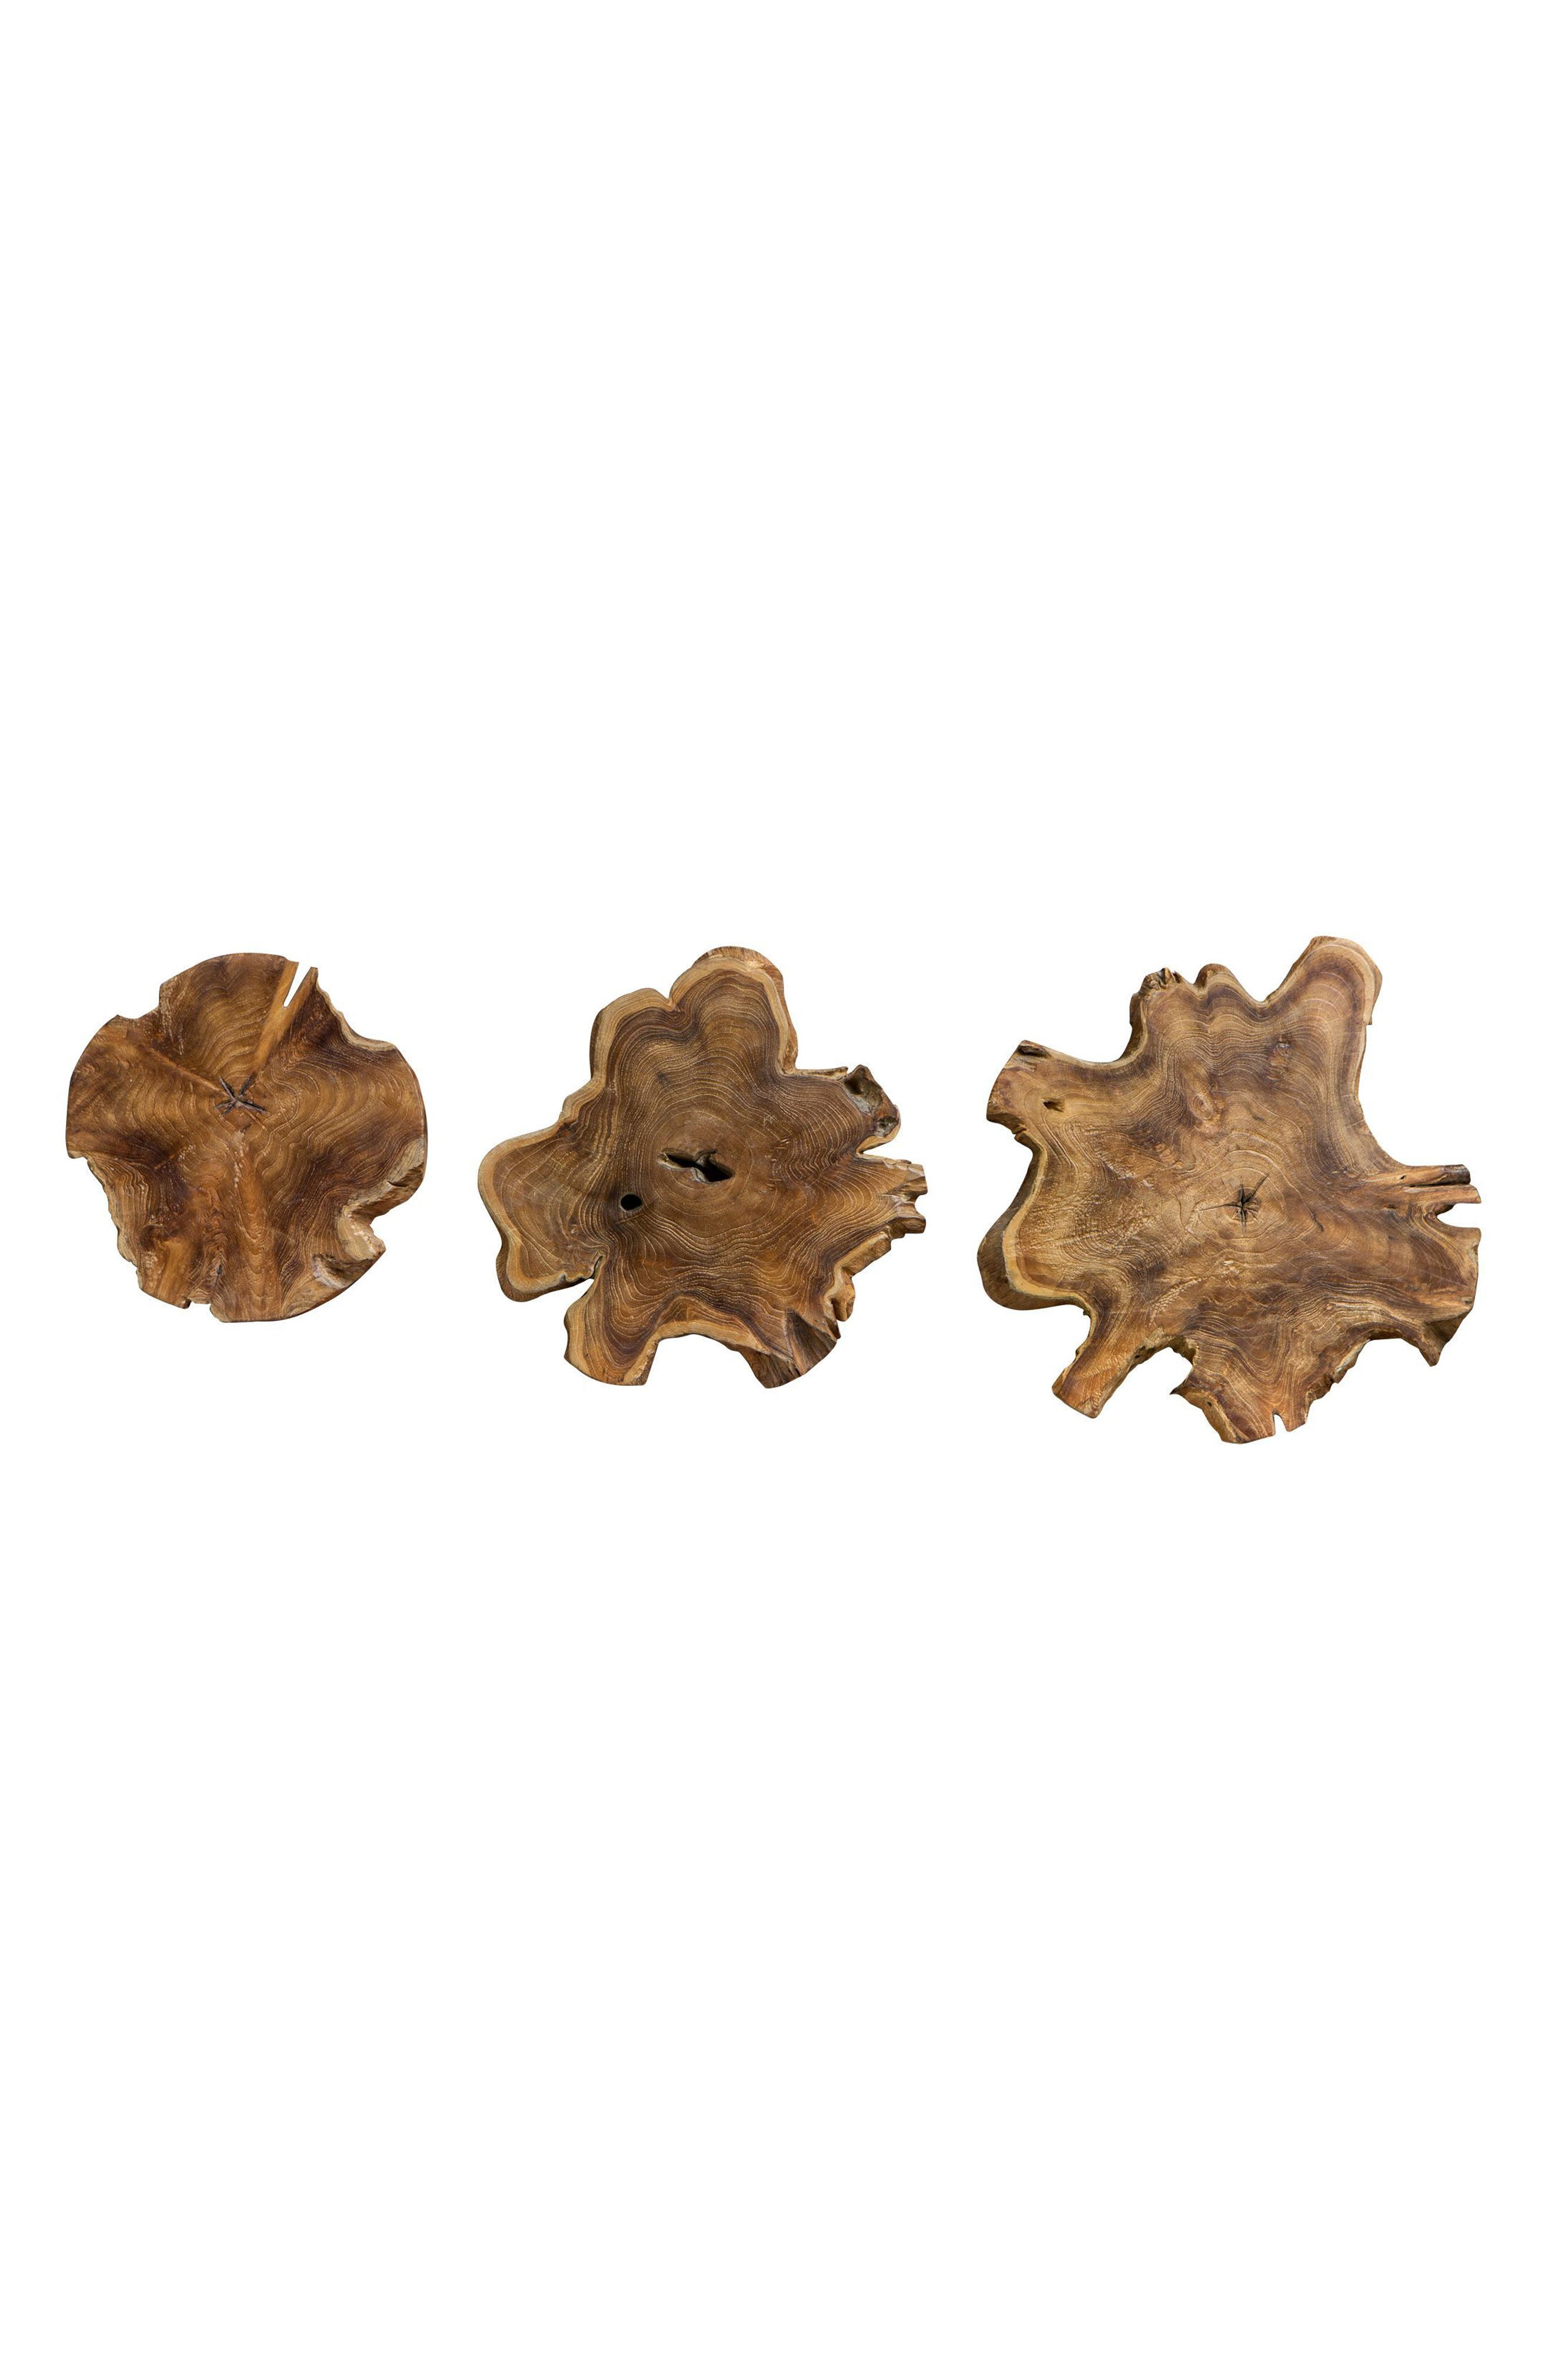 Alternate Image 1 Selected - Uttermost Kalani Set of 3 Wood Decorations